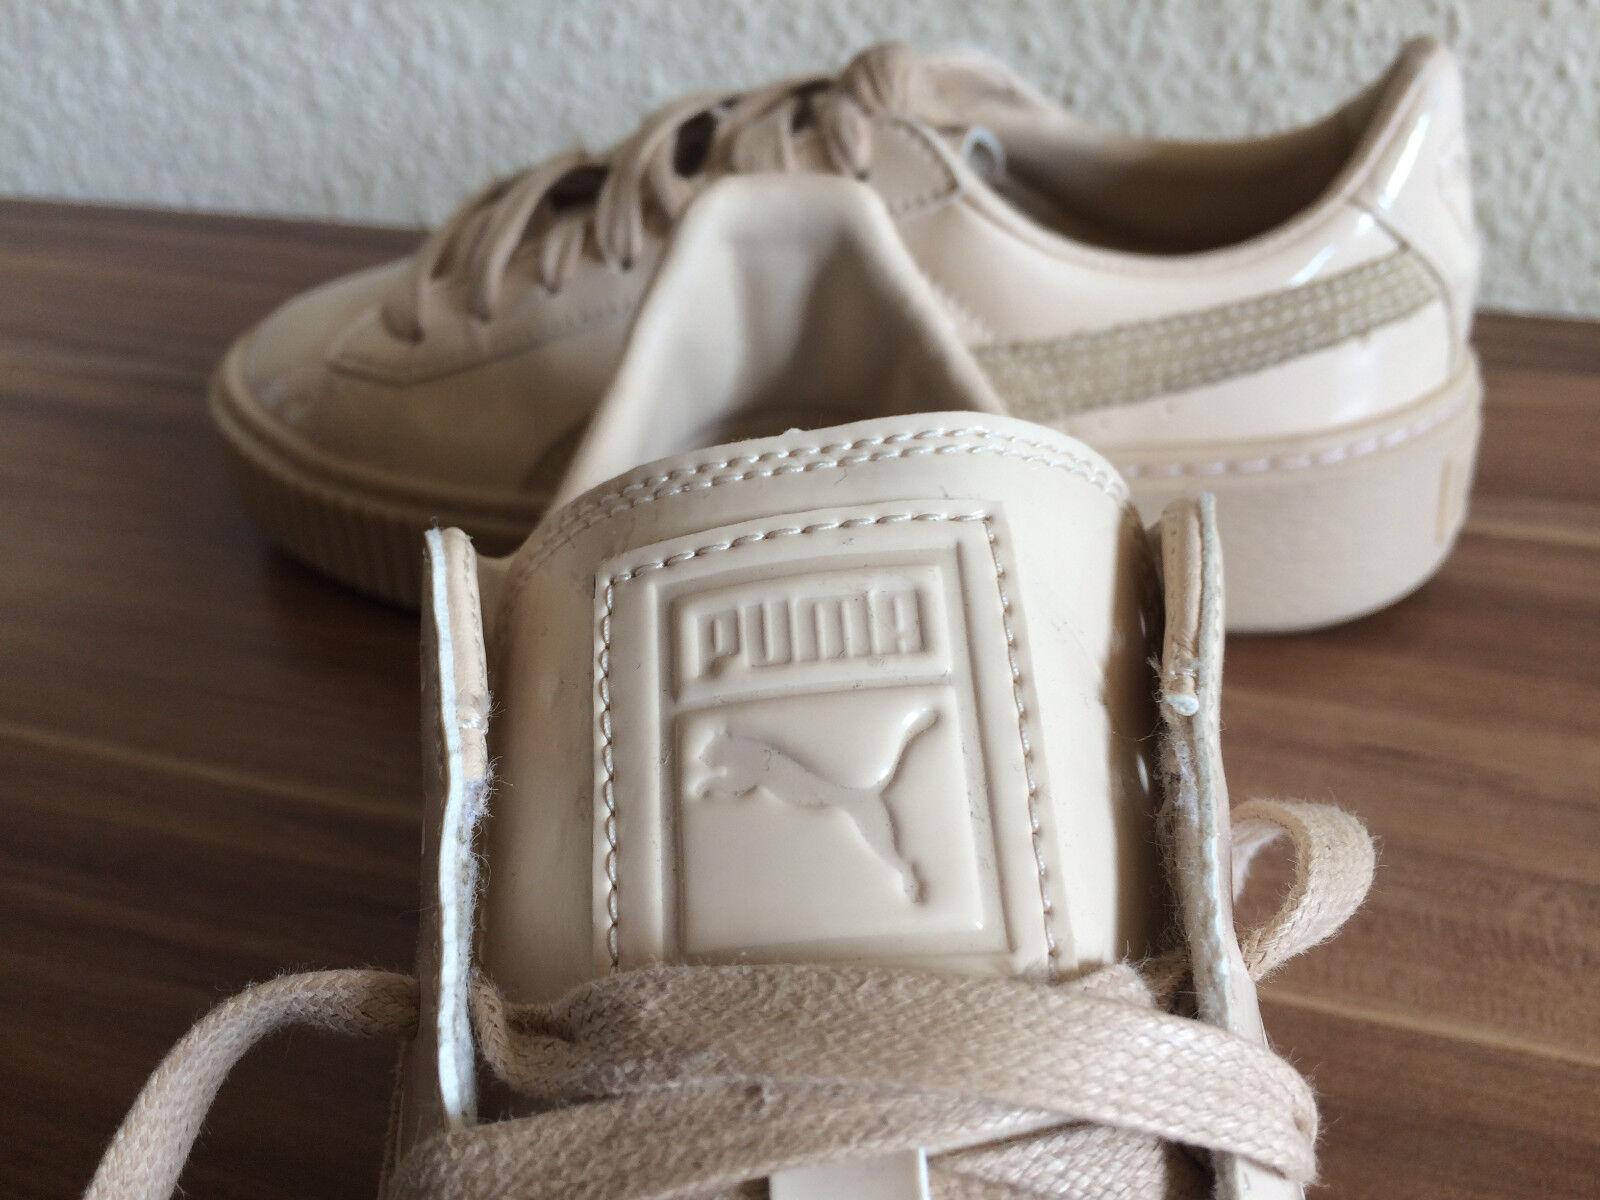 Super Puma Basket Platform Patent Sneaker Schuhe Top Sportschuhe Lack Gr. 37 Top Schuhe a2240a